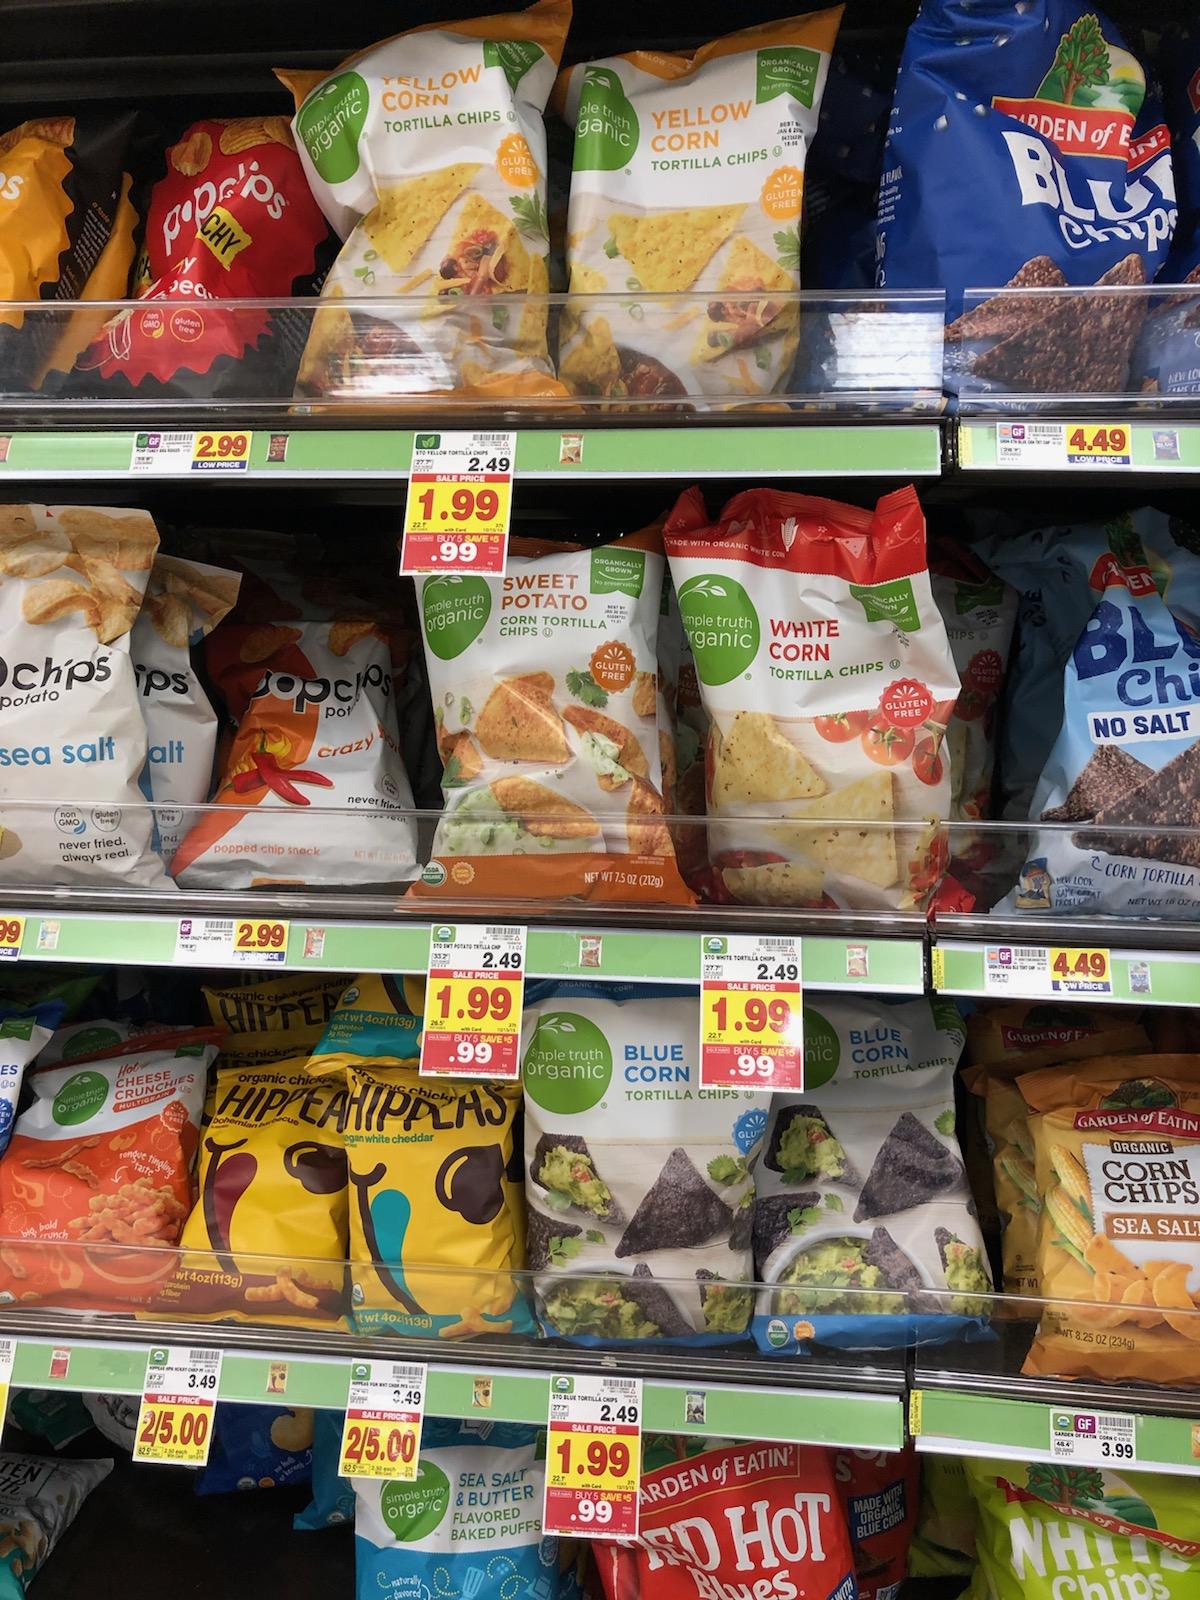 Simple Truth Chips - 99¢ During The Kroger Mega Sale 1